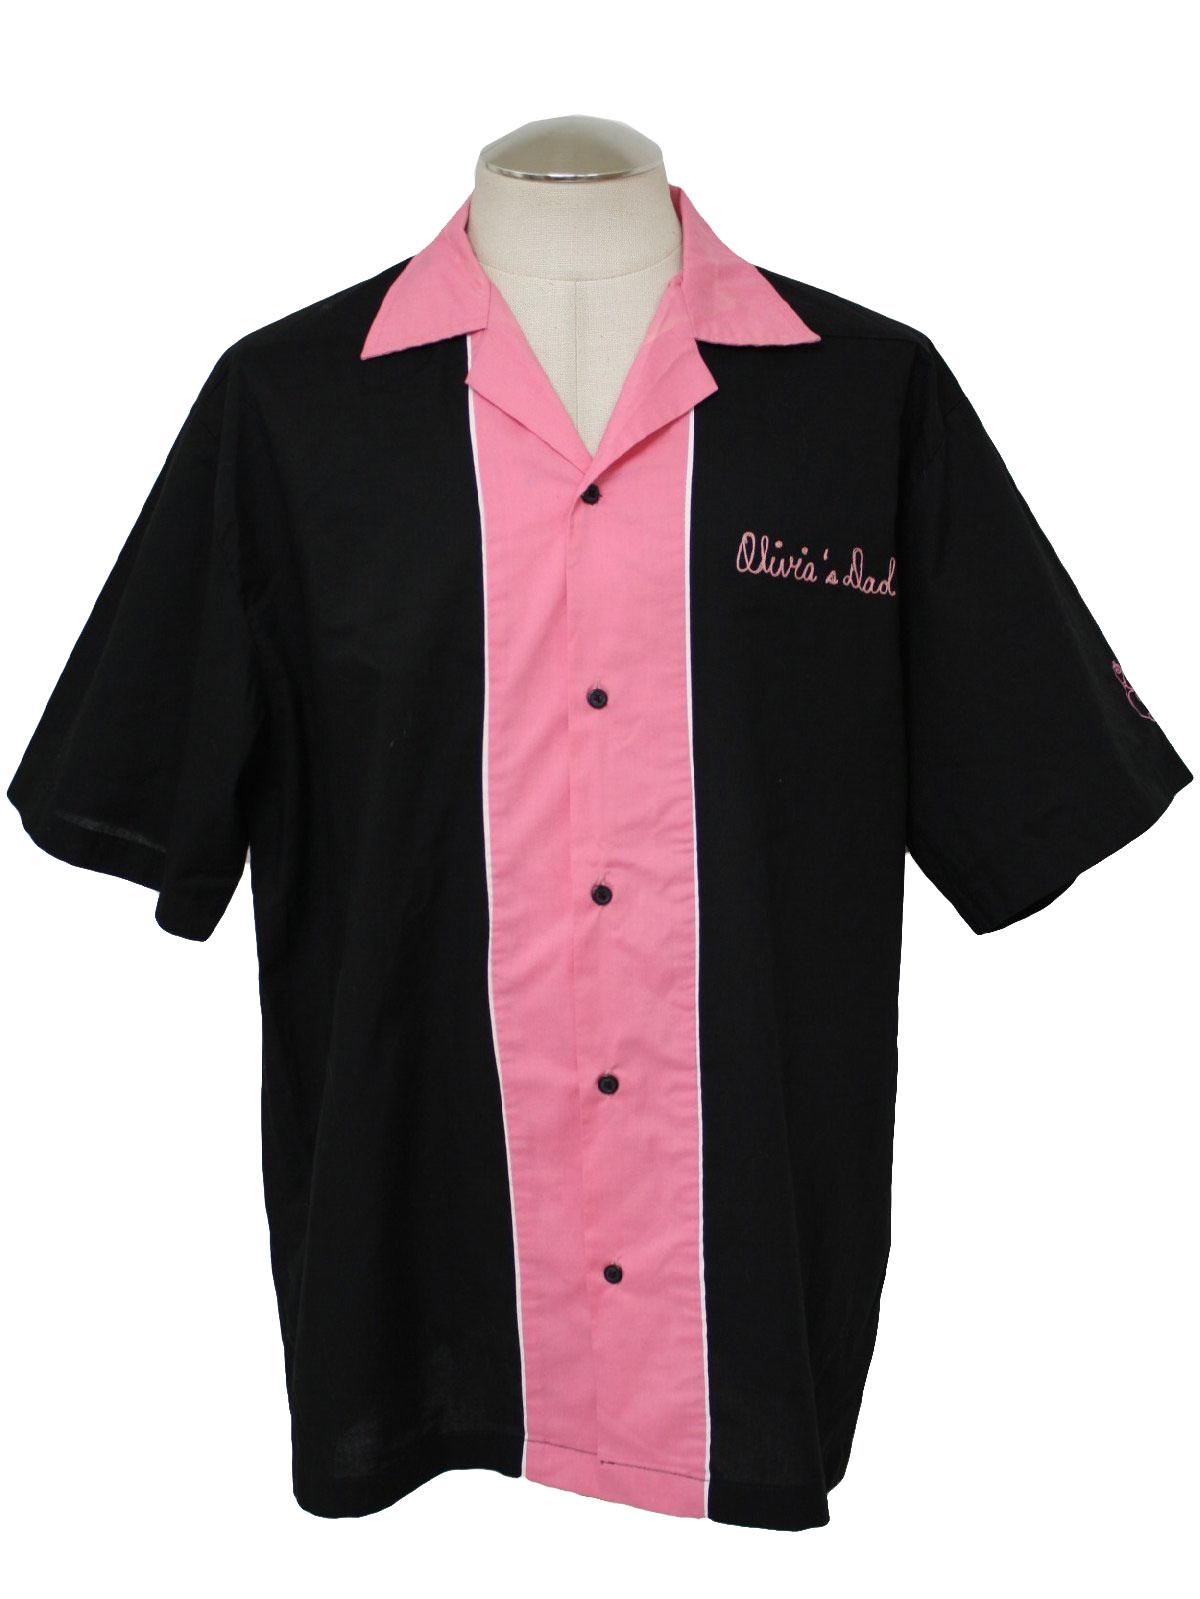 Retro 1990's Bowling Shirt (Cruisin USA) : 90s -Cruisin USA- Mens ...